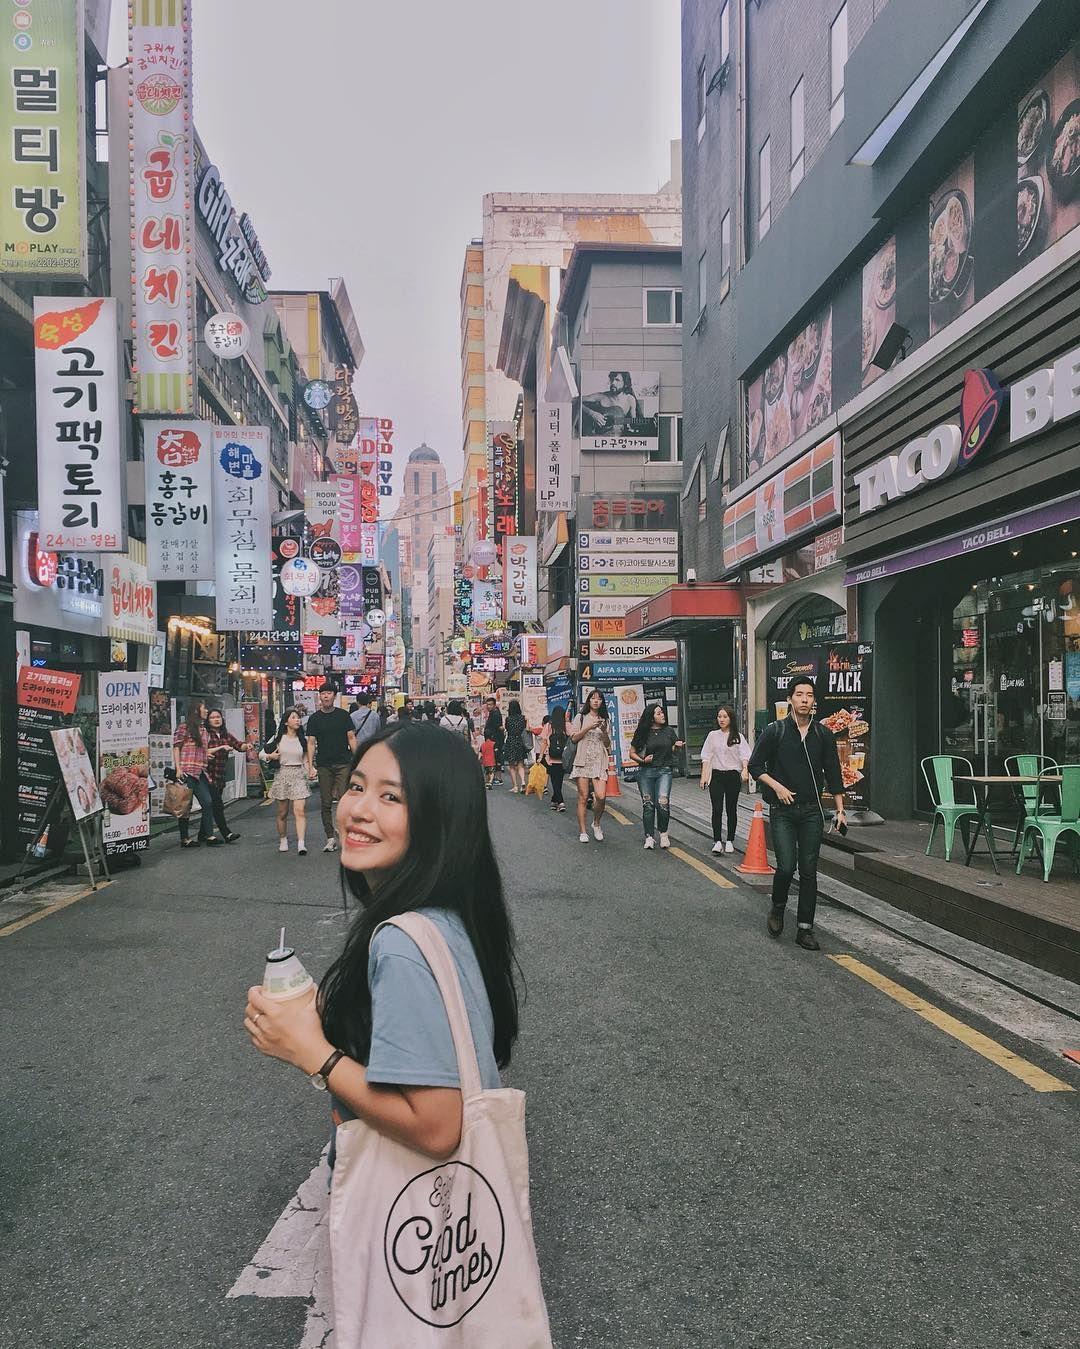 "19.3k Likes, 95 Comments - ★彡 (@mantienn) on Instagram: ""Sữa chuối everyday Cc: @numanazami8"""